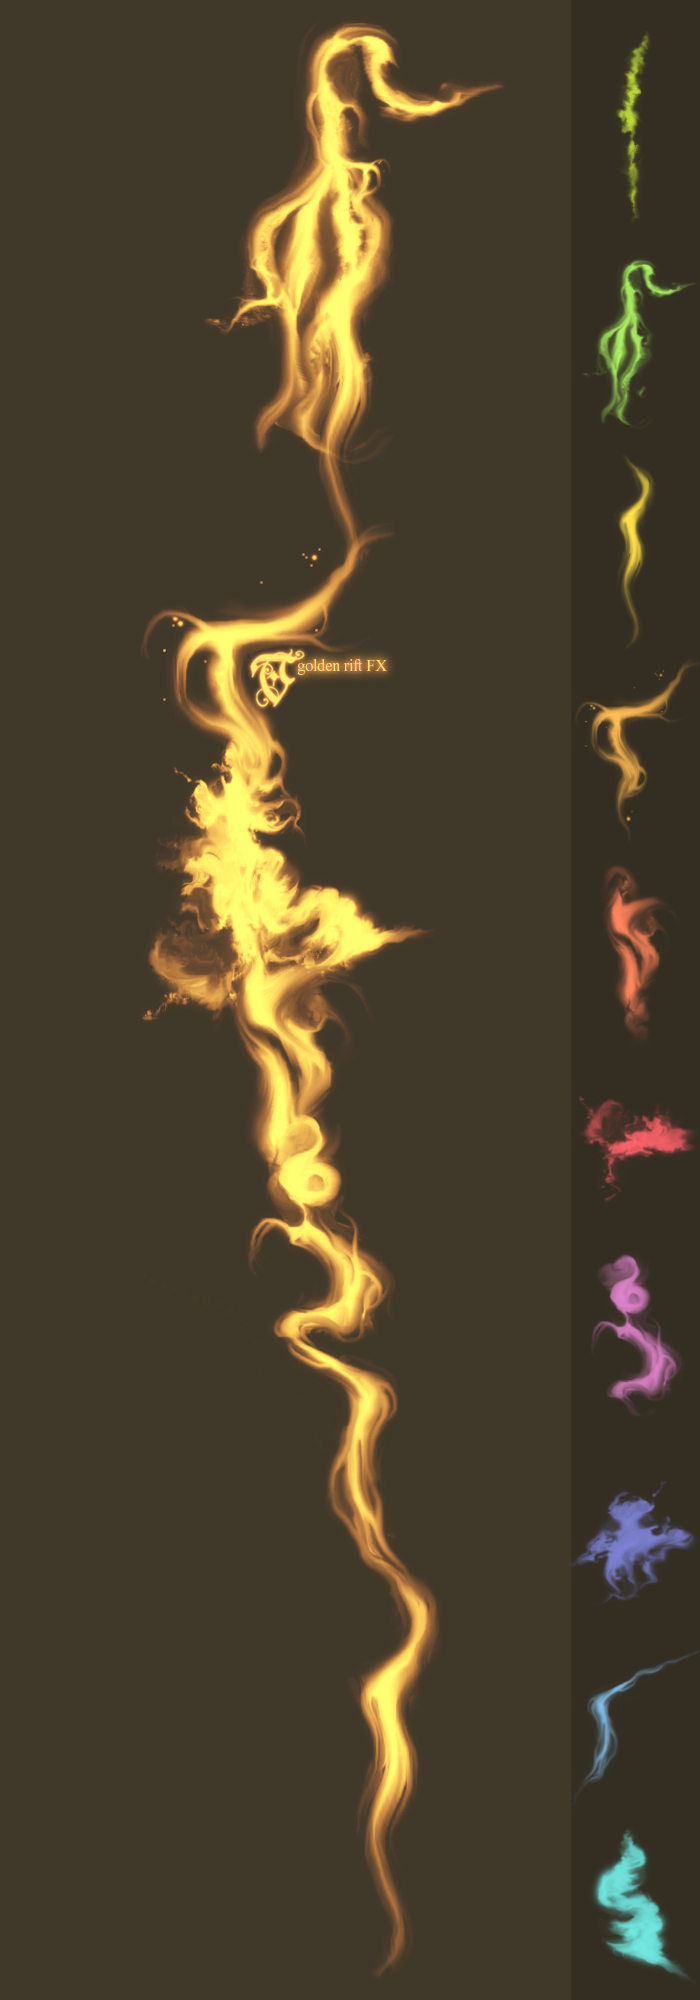 TC ~ E P I C A ~ VII   golden rift FX by TreehouseCharms